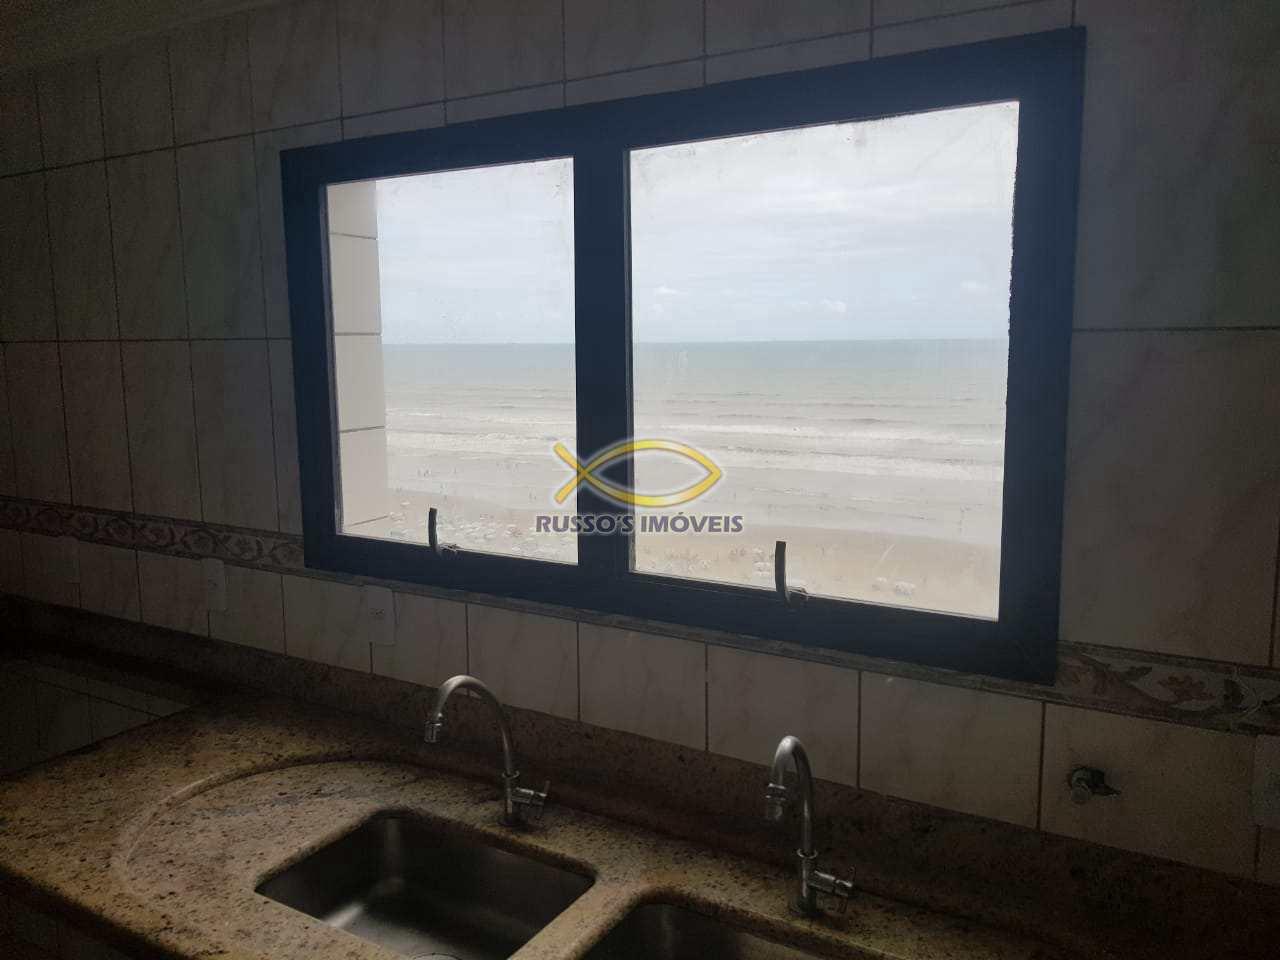 Cobertura com 3 dorms, Mirim, Praia Grande - R$ 400 mil, Cod: 60019944